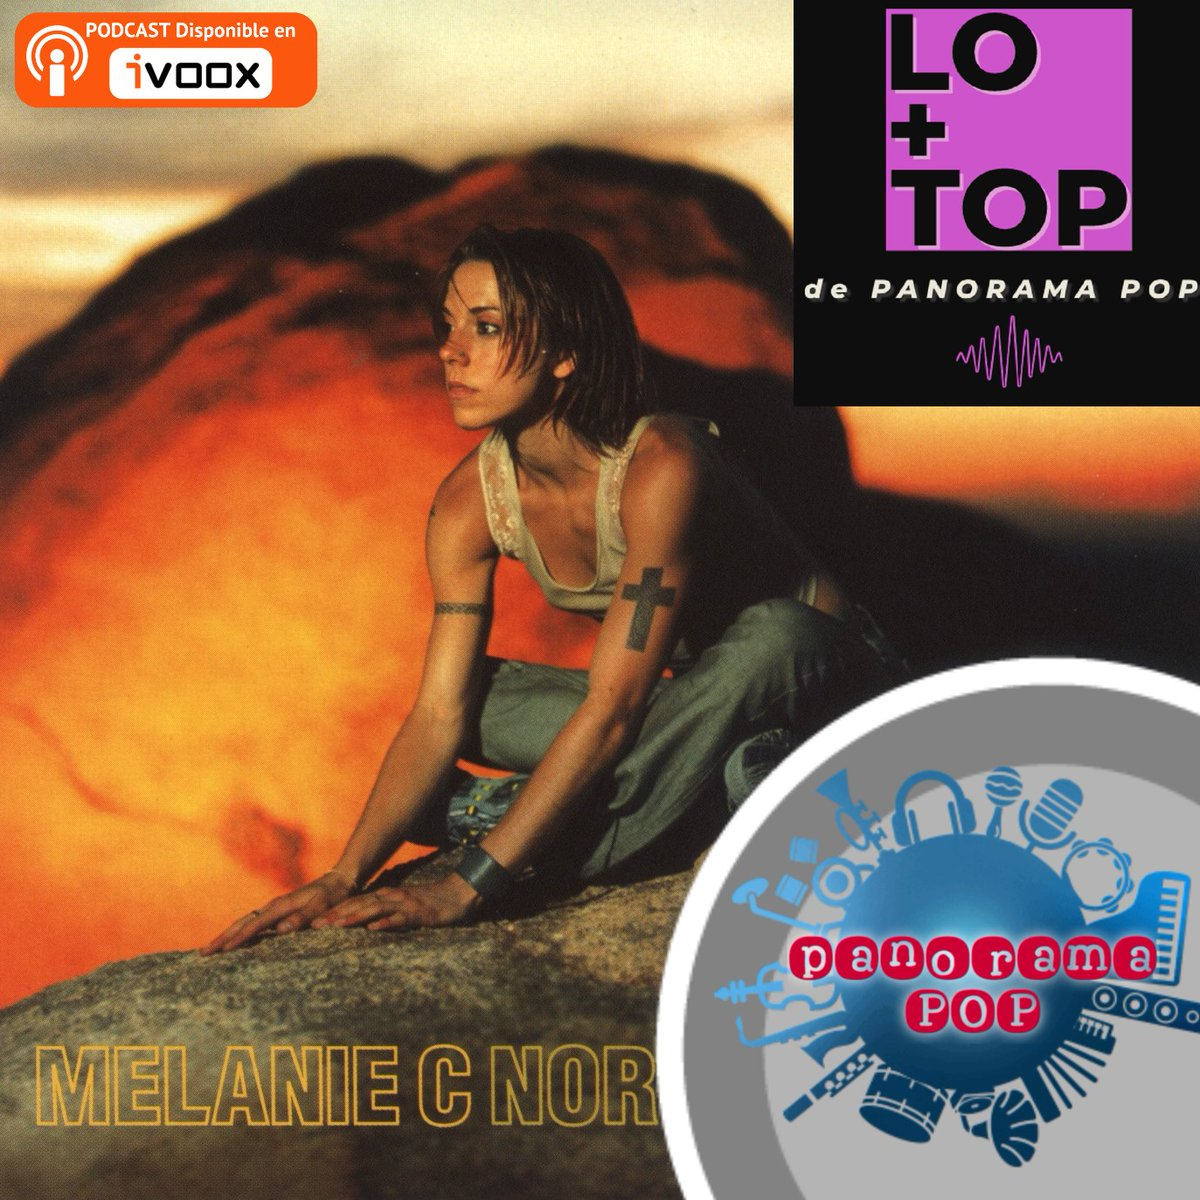 "#PanoramaPOP ""Northern Star"", album debut de Melanie C   🔰🔰ESCUCHANOS AQUI🔰🔰 https://t.co/2HwJbgmk8k   #podcast #ivoox #northernstar #melaniec #melc #musica #music #gay https://t.co/onFDCpmLzB"